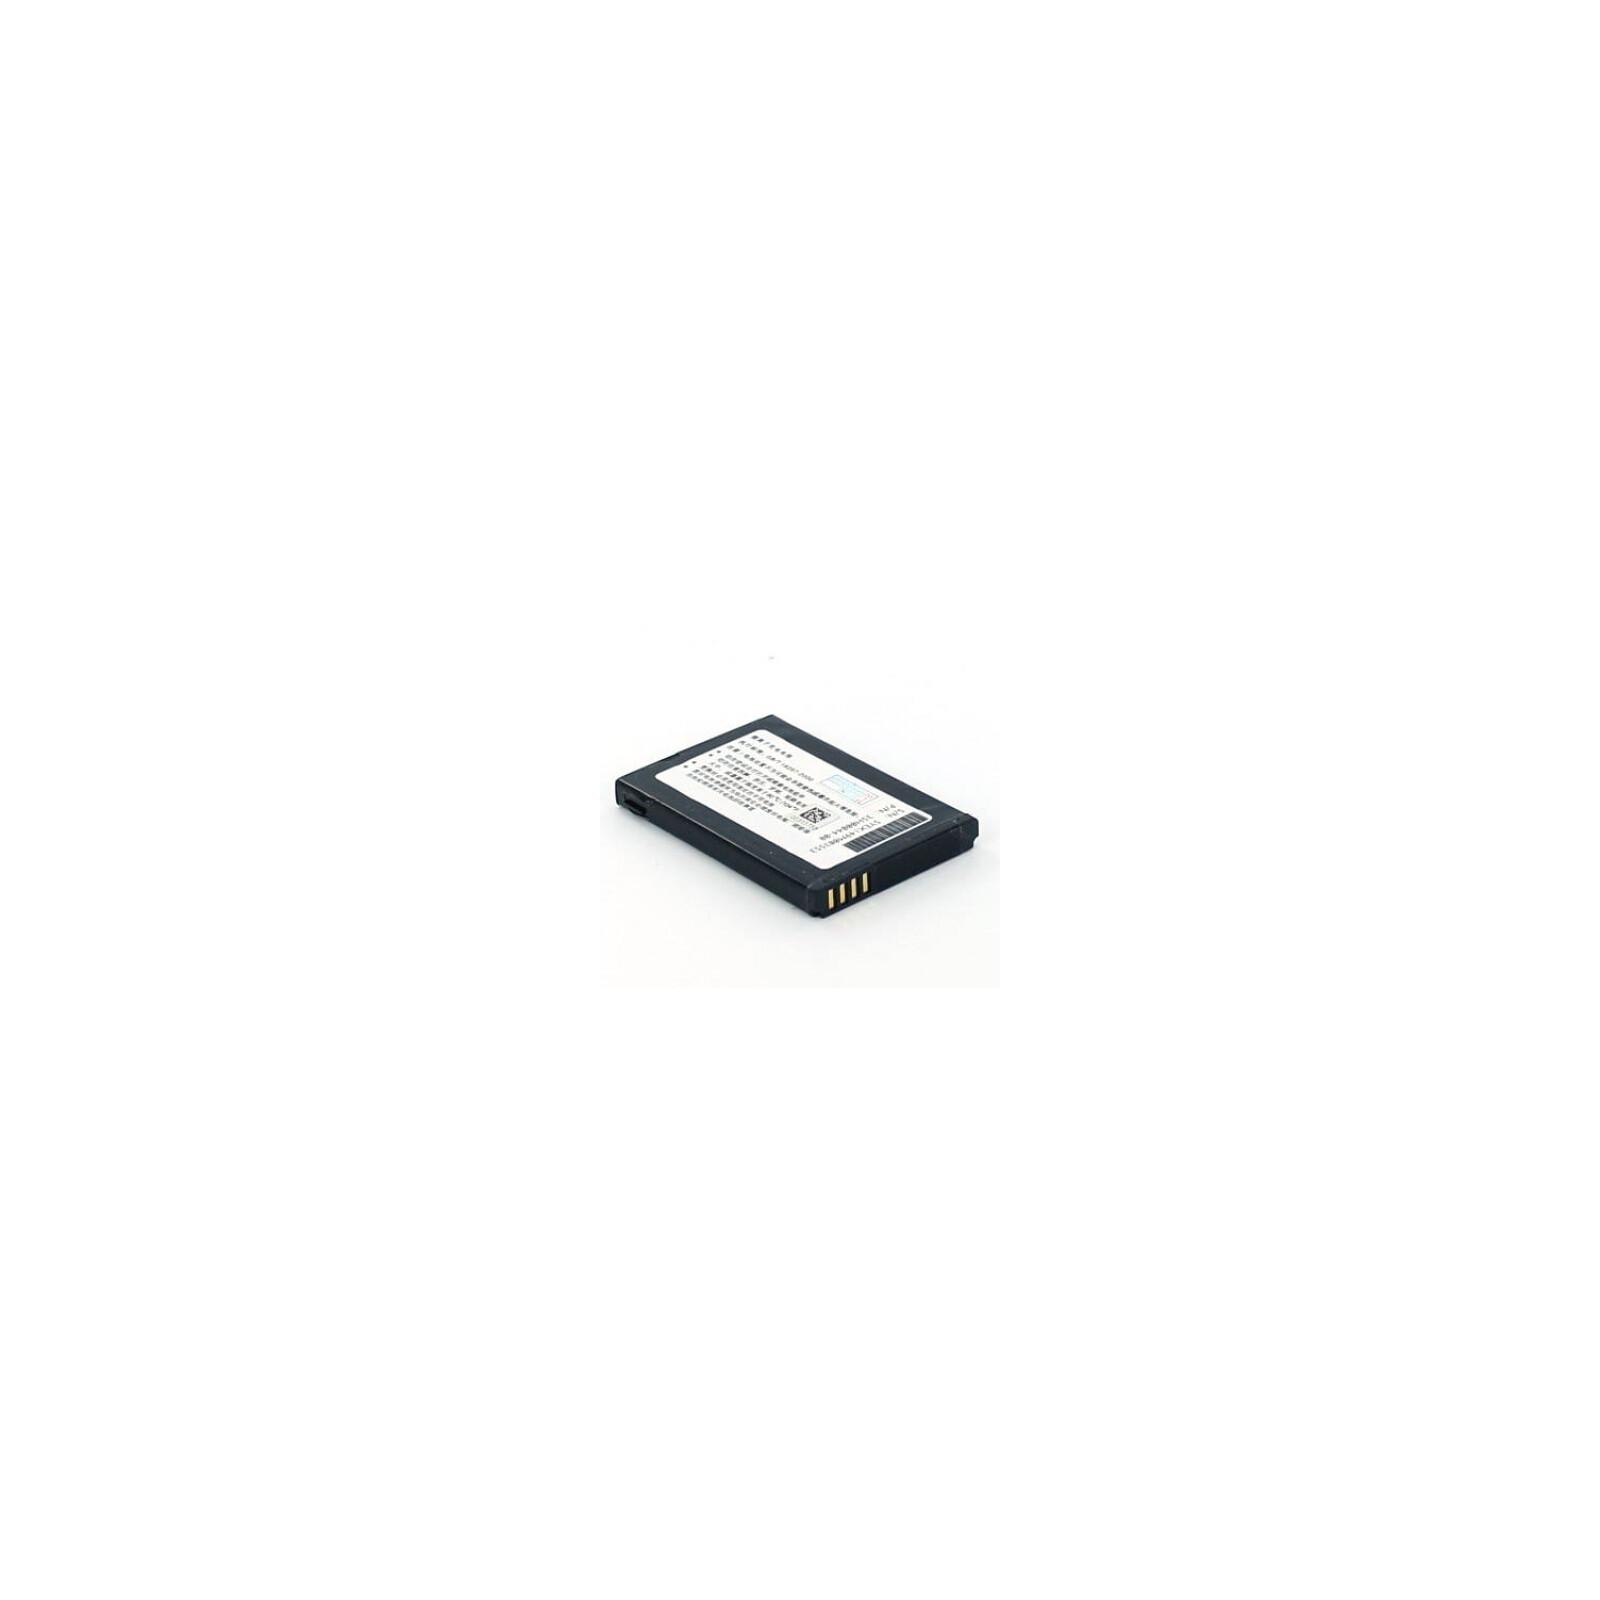 AGI Akku HTC Pharos 100 1.050mAh